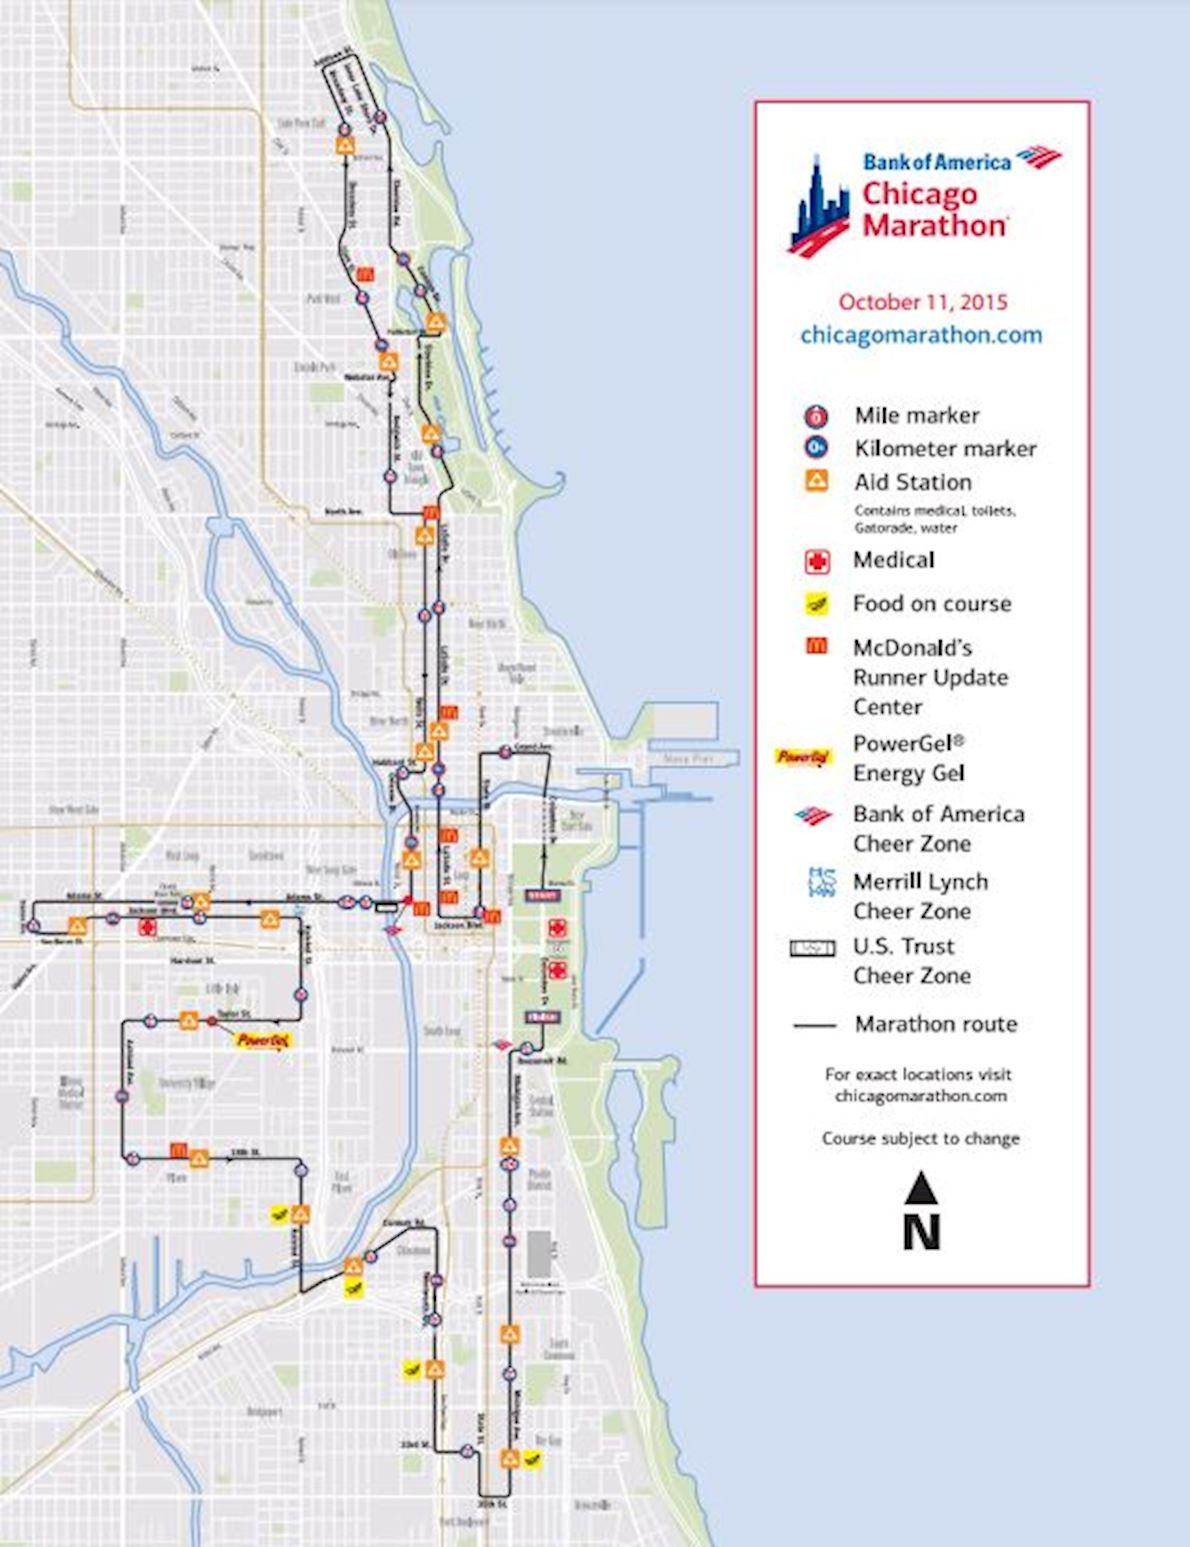 Bank of America Chicago Marathon, Oct 13 2019 | World's Marathons